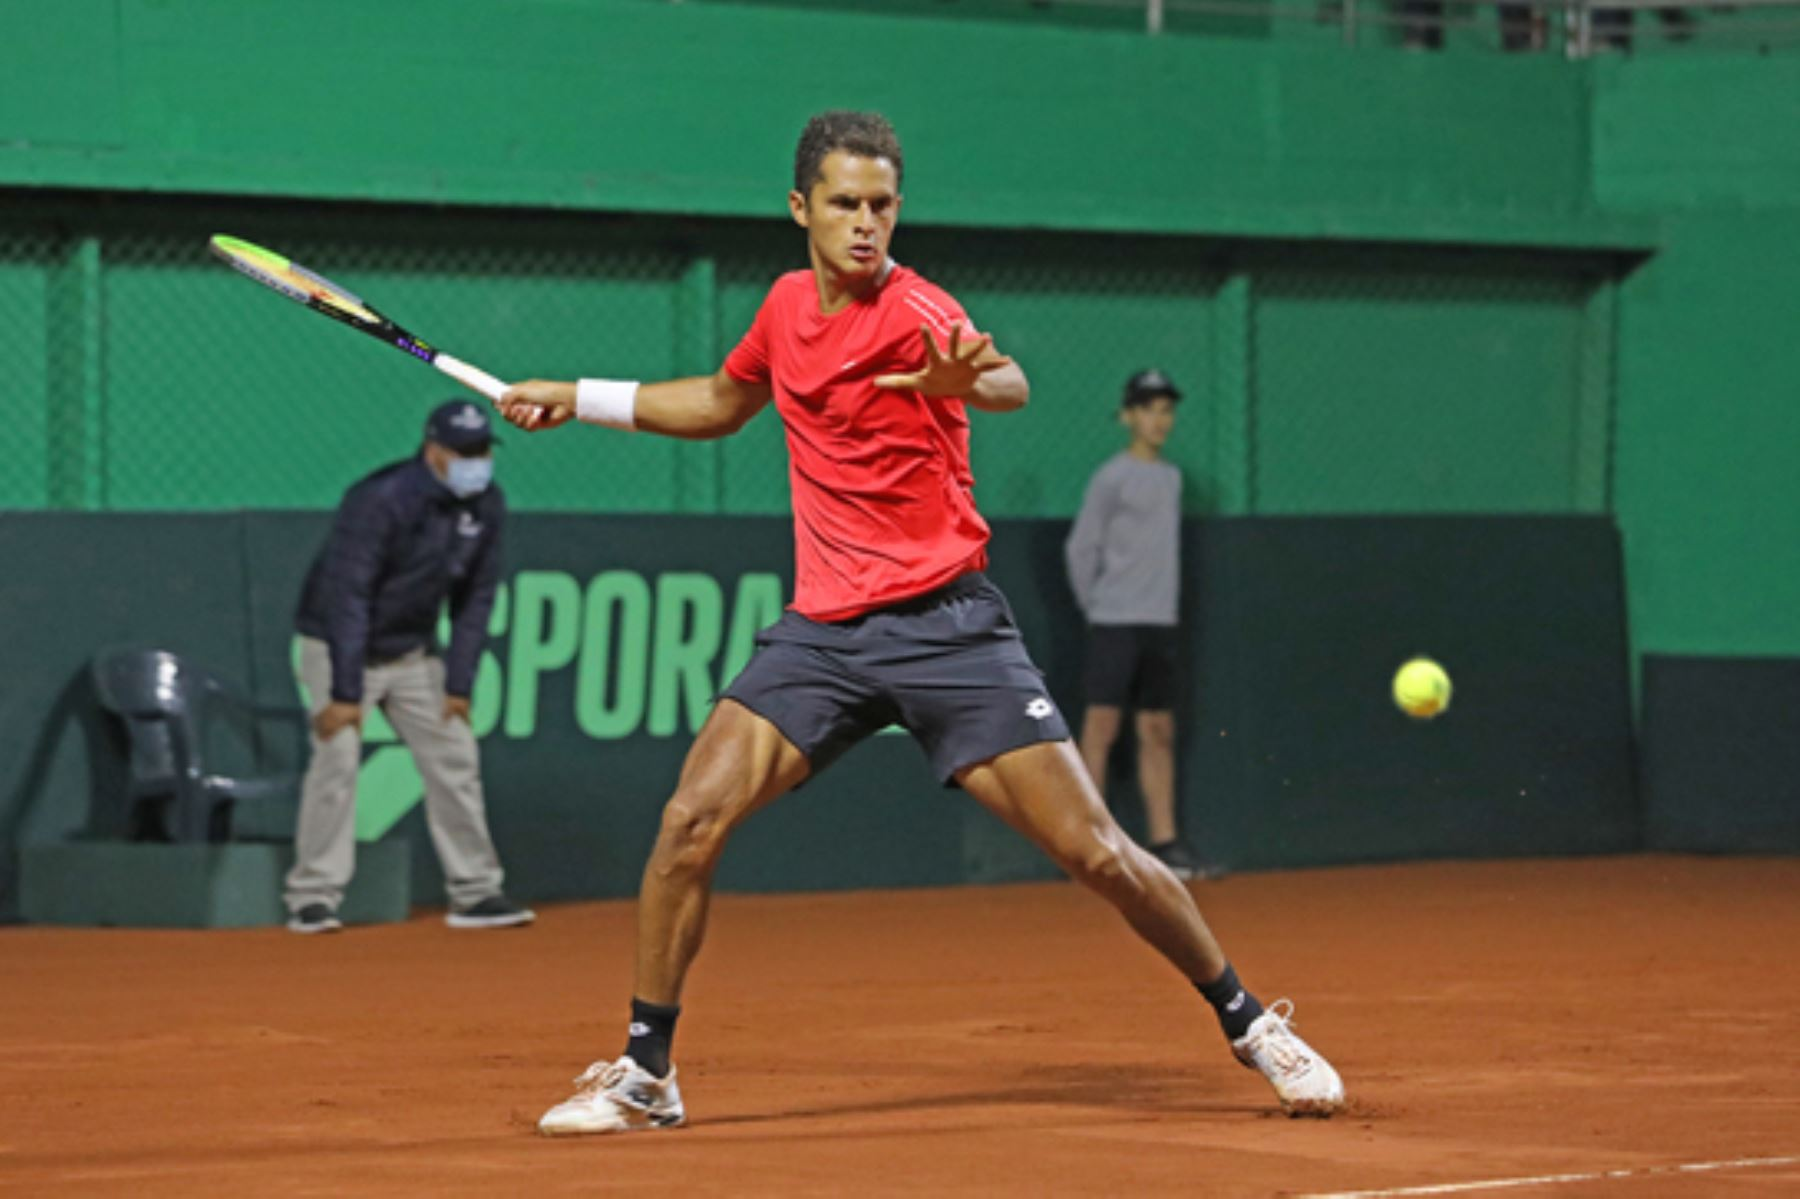 Tenista peruano Juan Pablo Varillas campeona en Challenger de Santiago 2